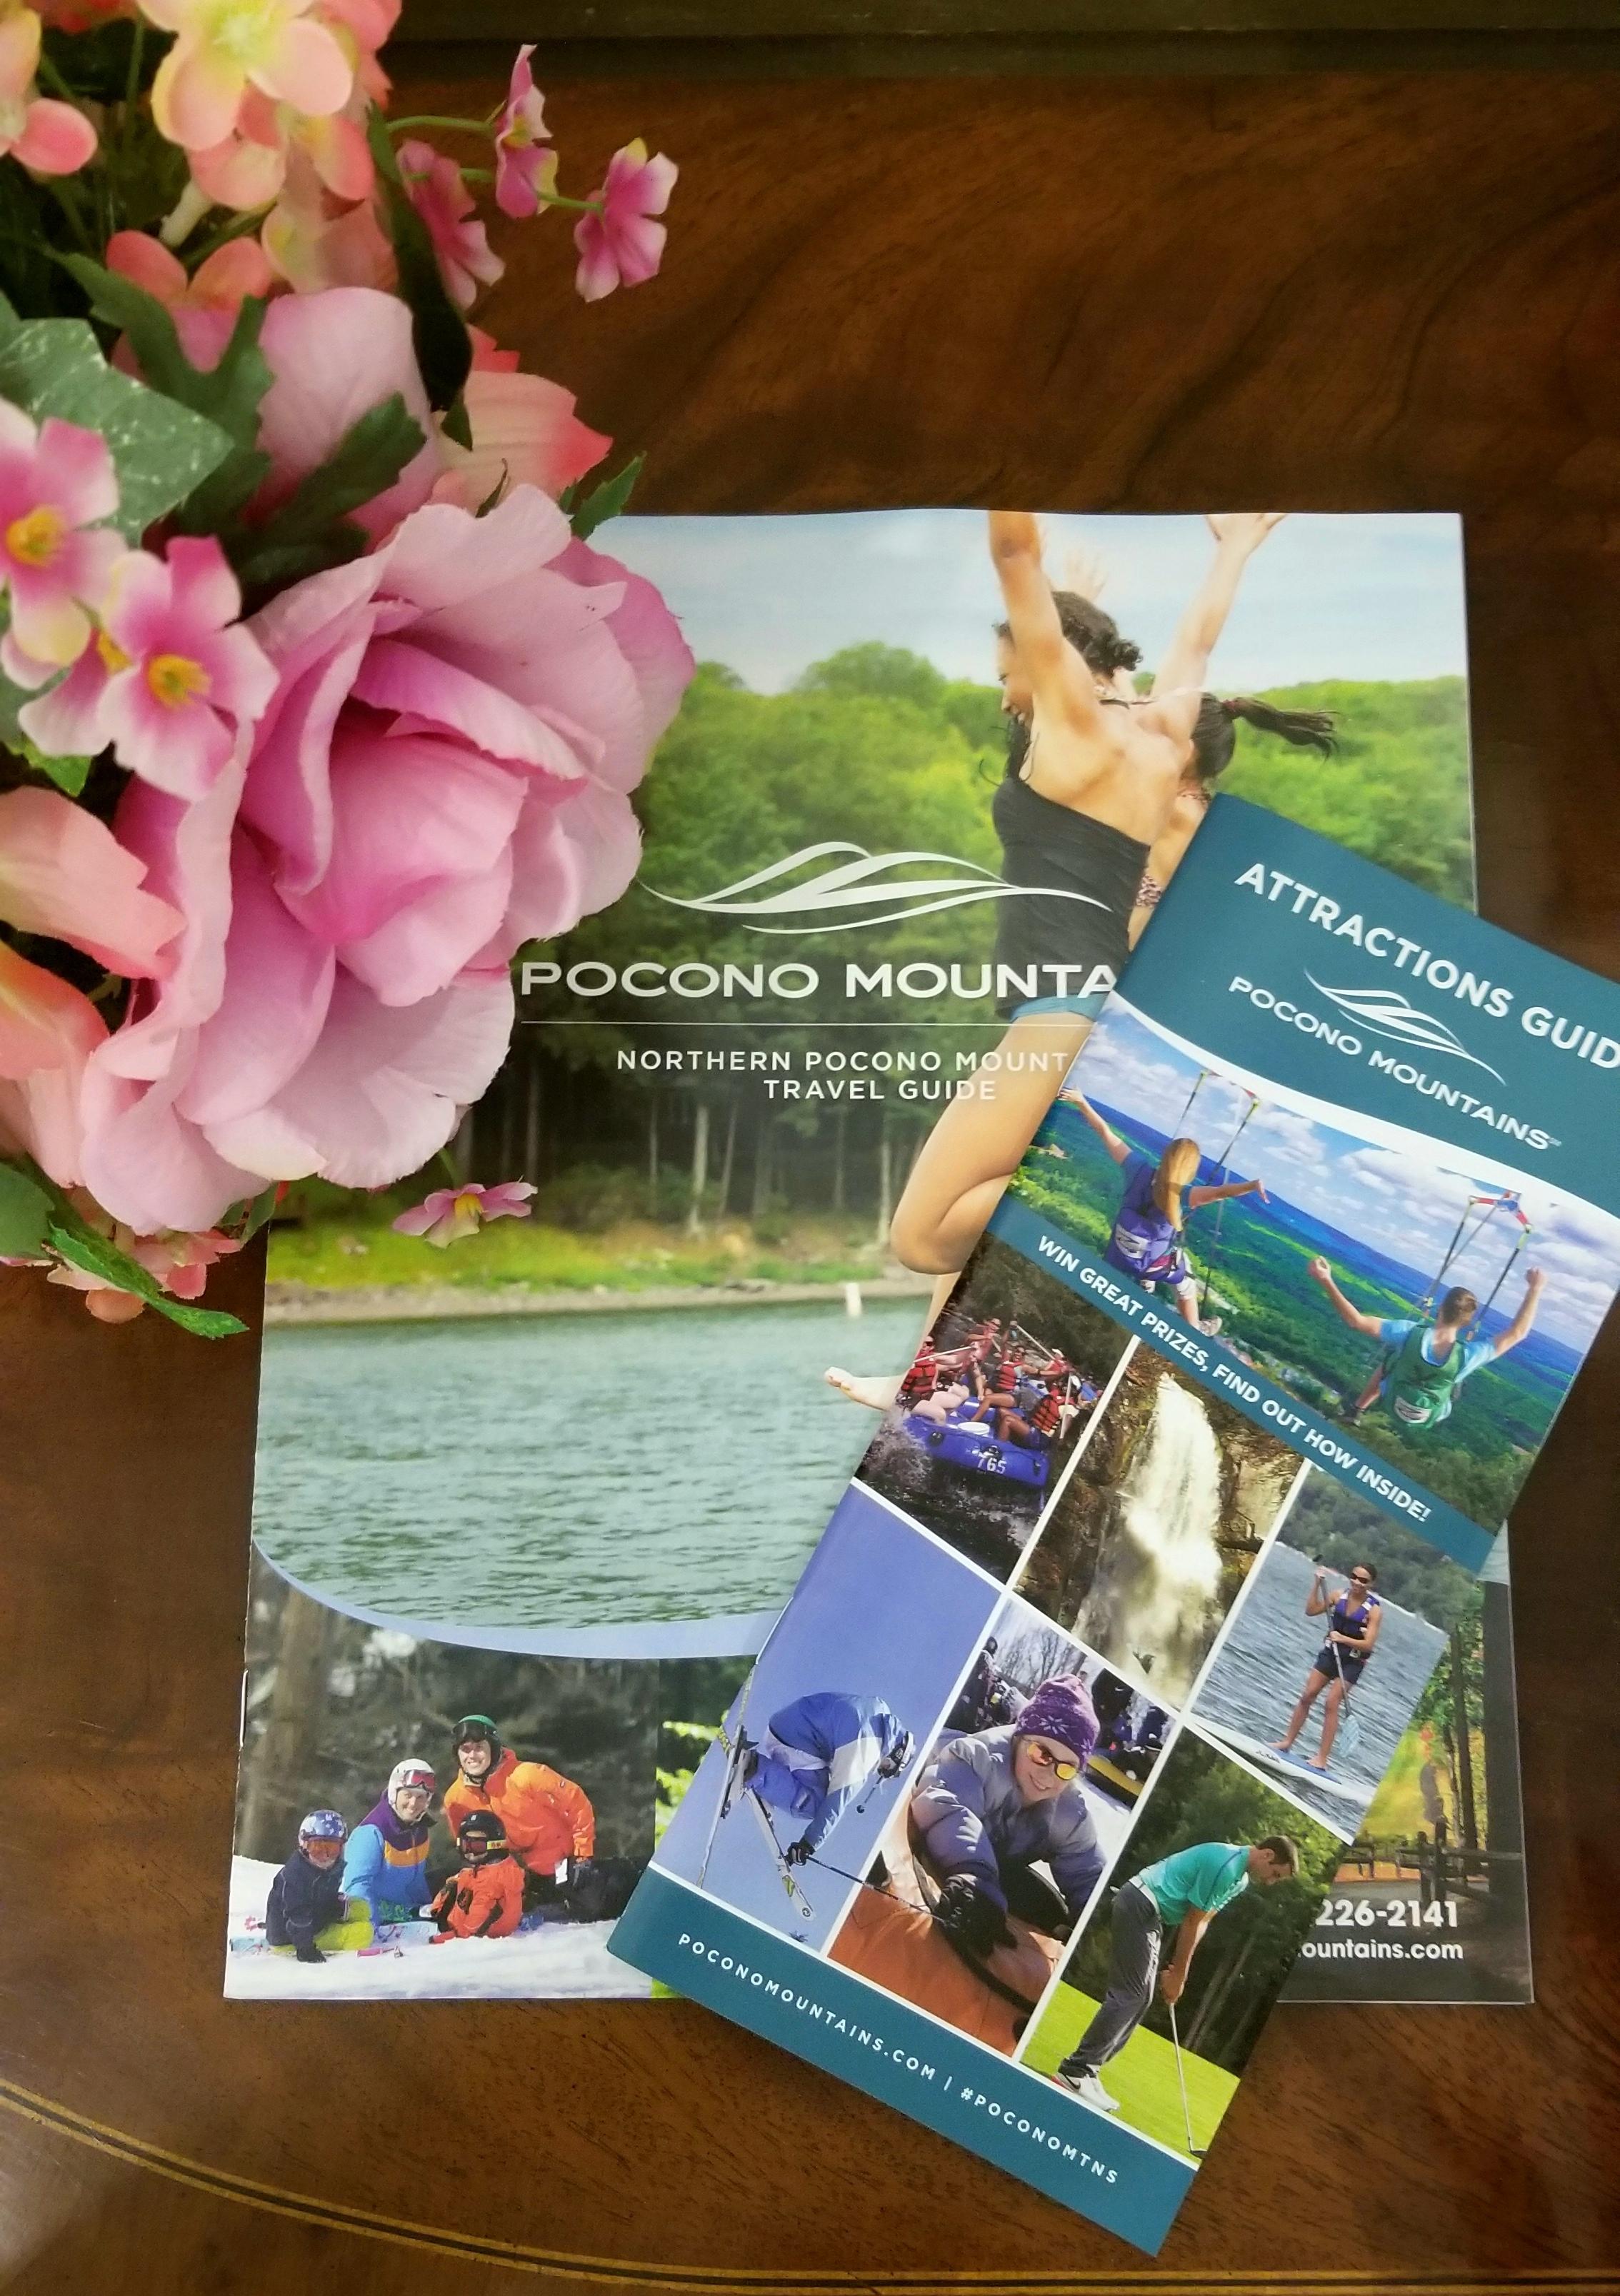 Poconos Mountains Visitors Bureau.jpeg